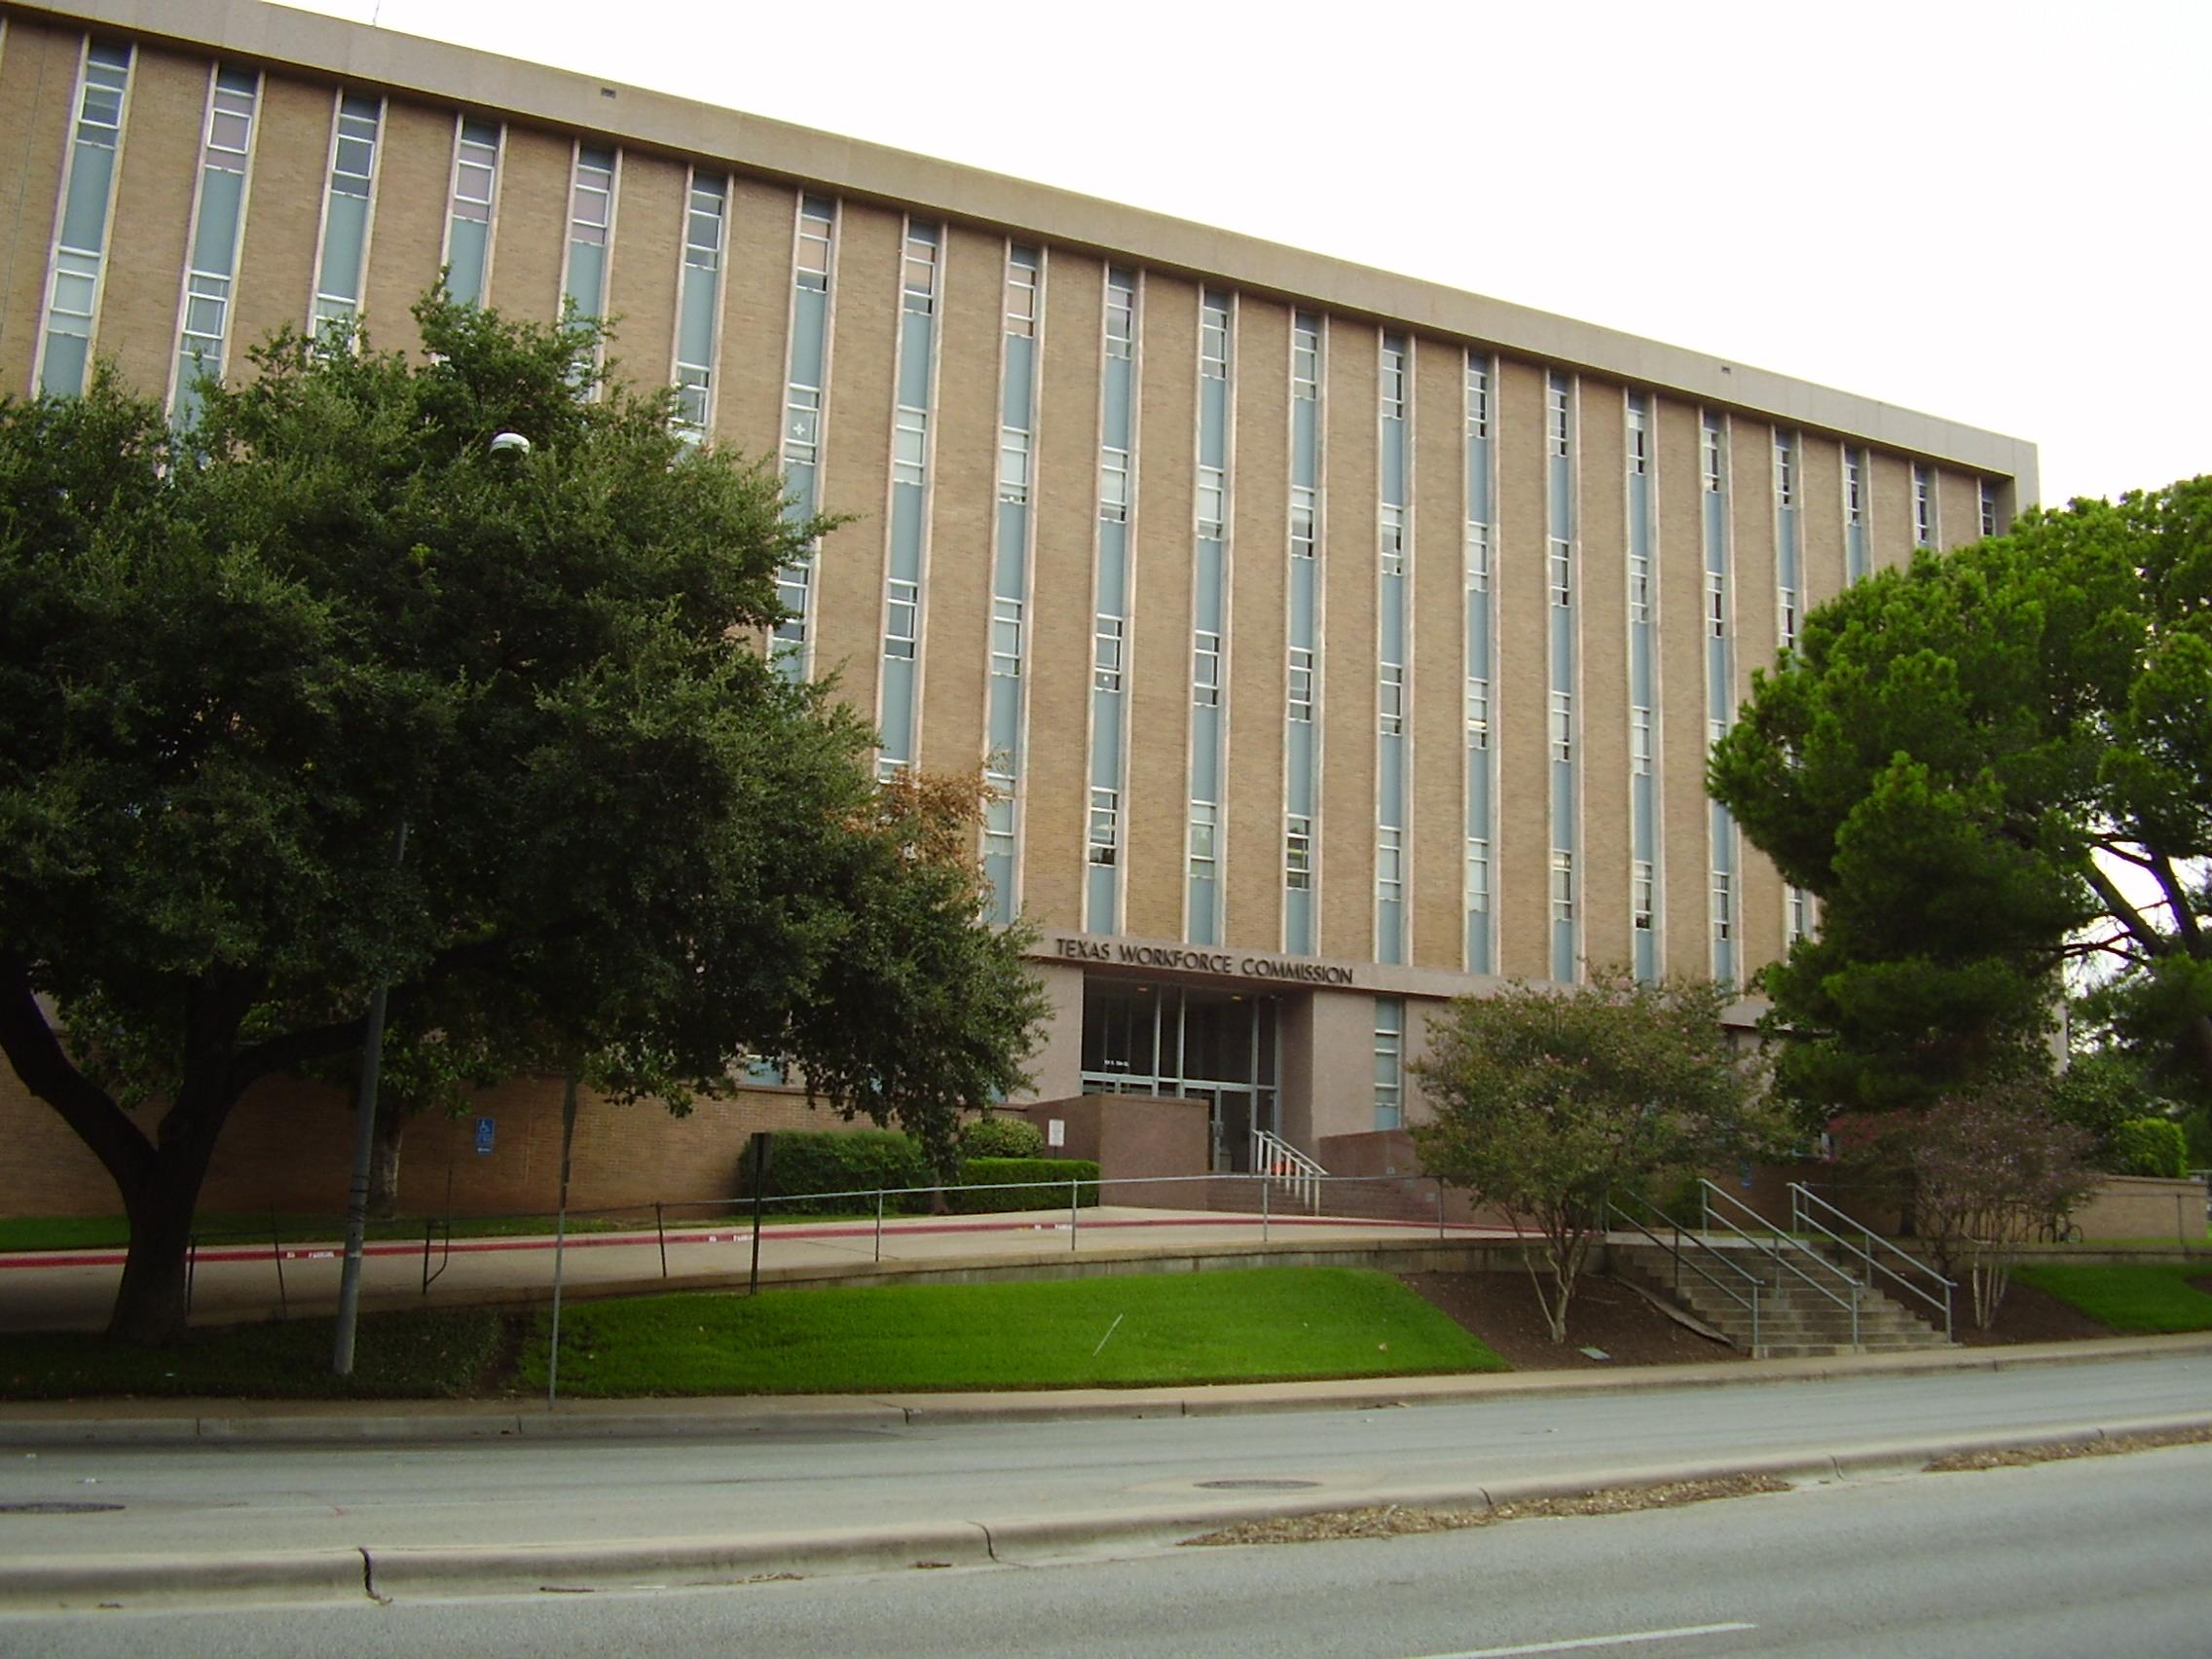 Texas Workforce Commission Wikipedia